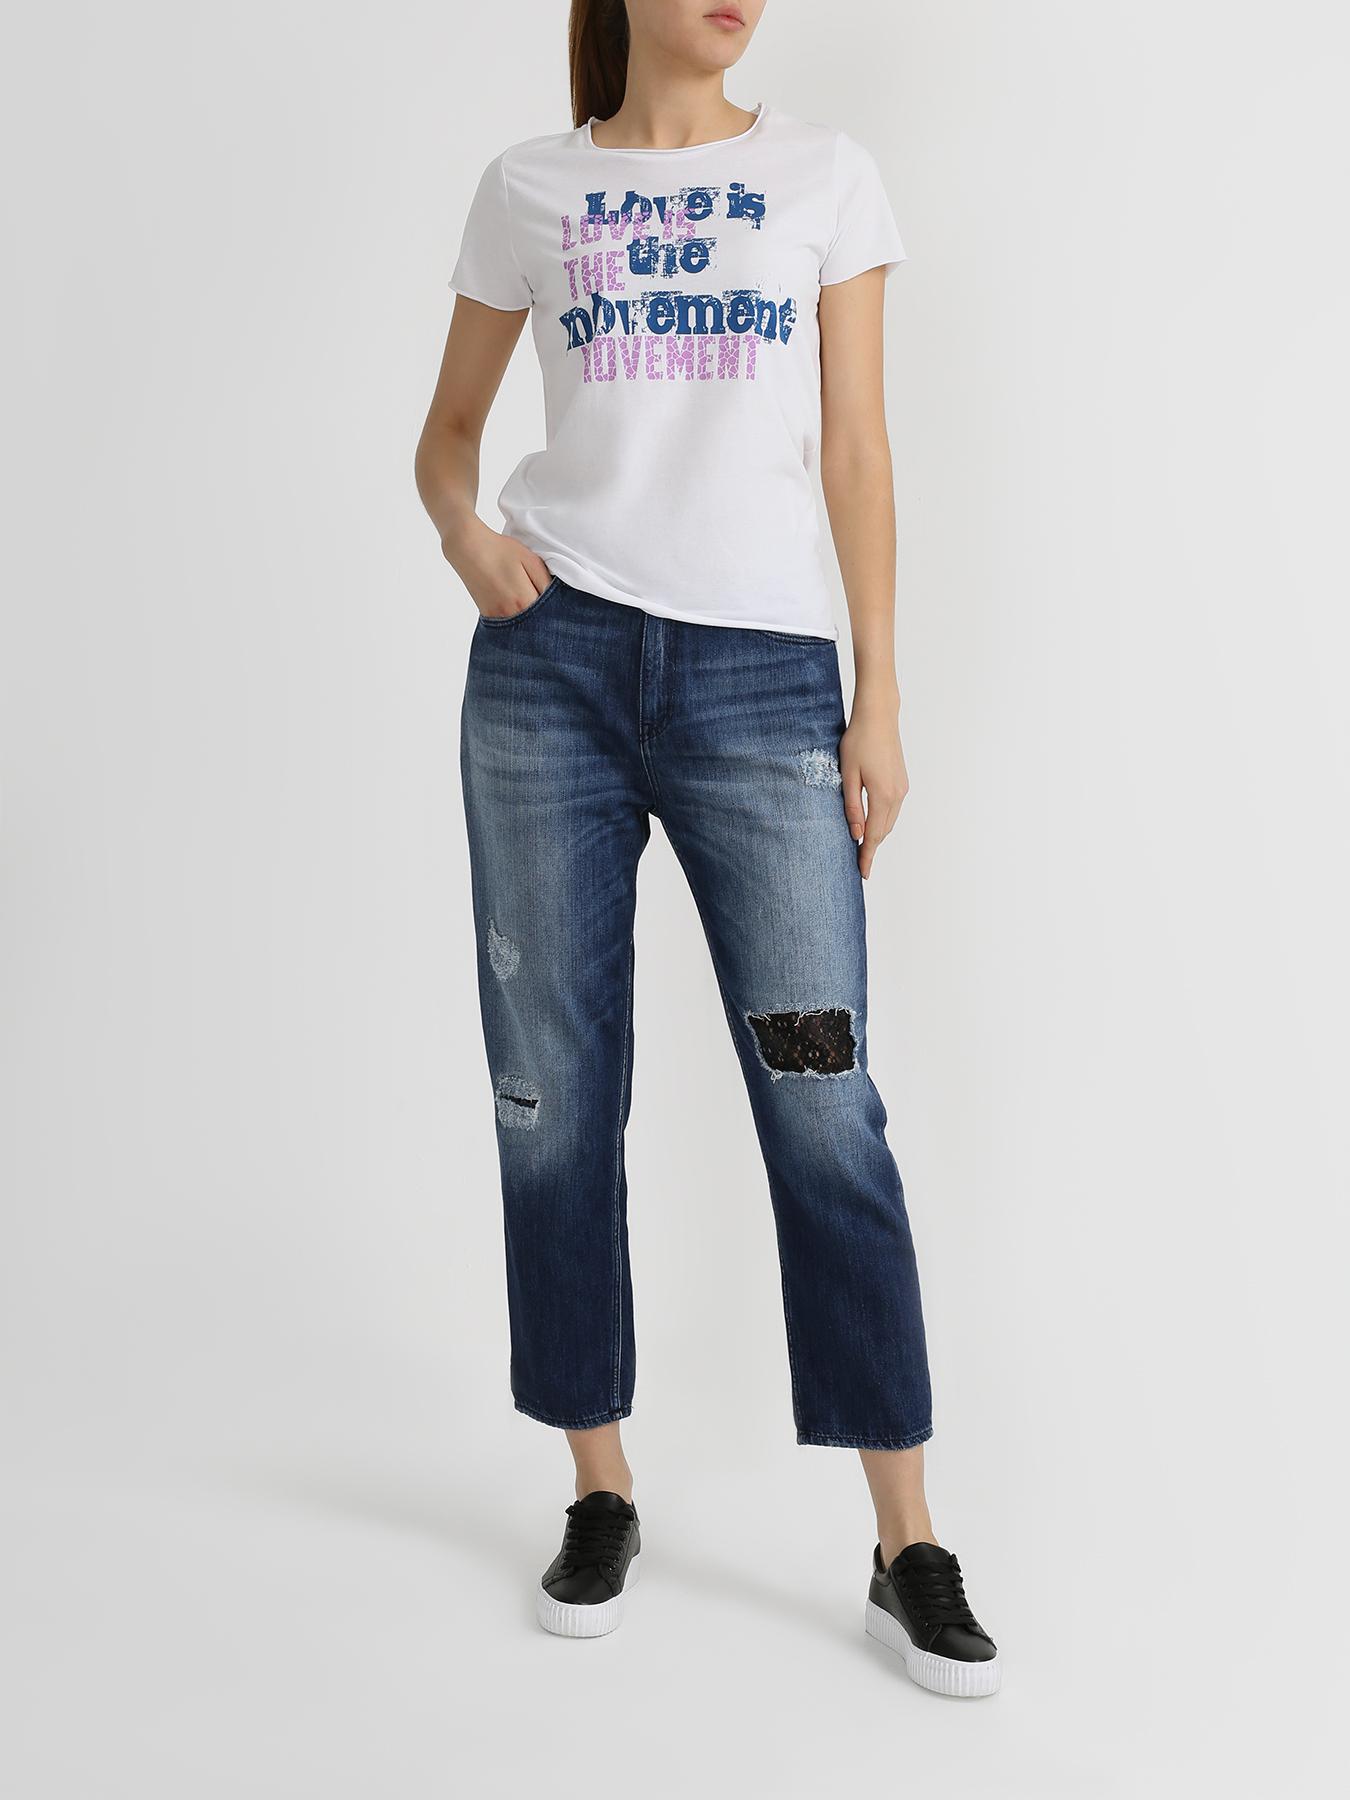 Брюки Love Moschino Рваные джинсы